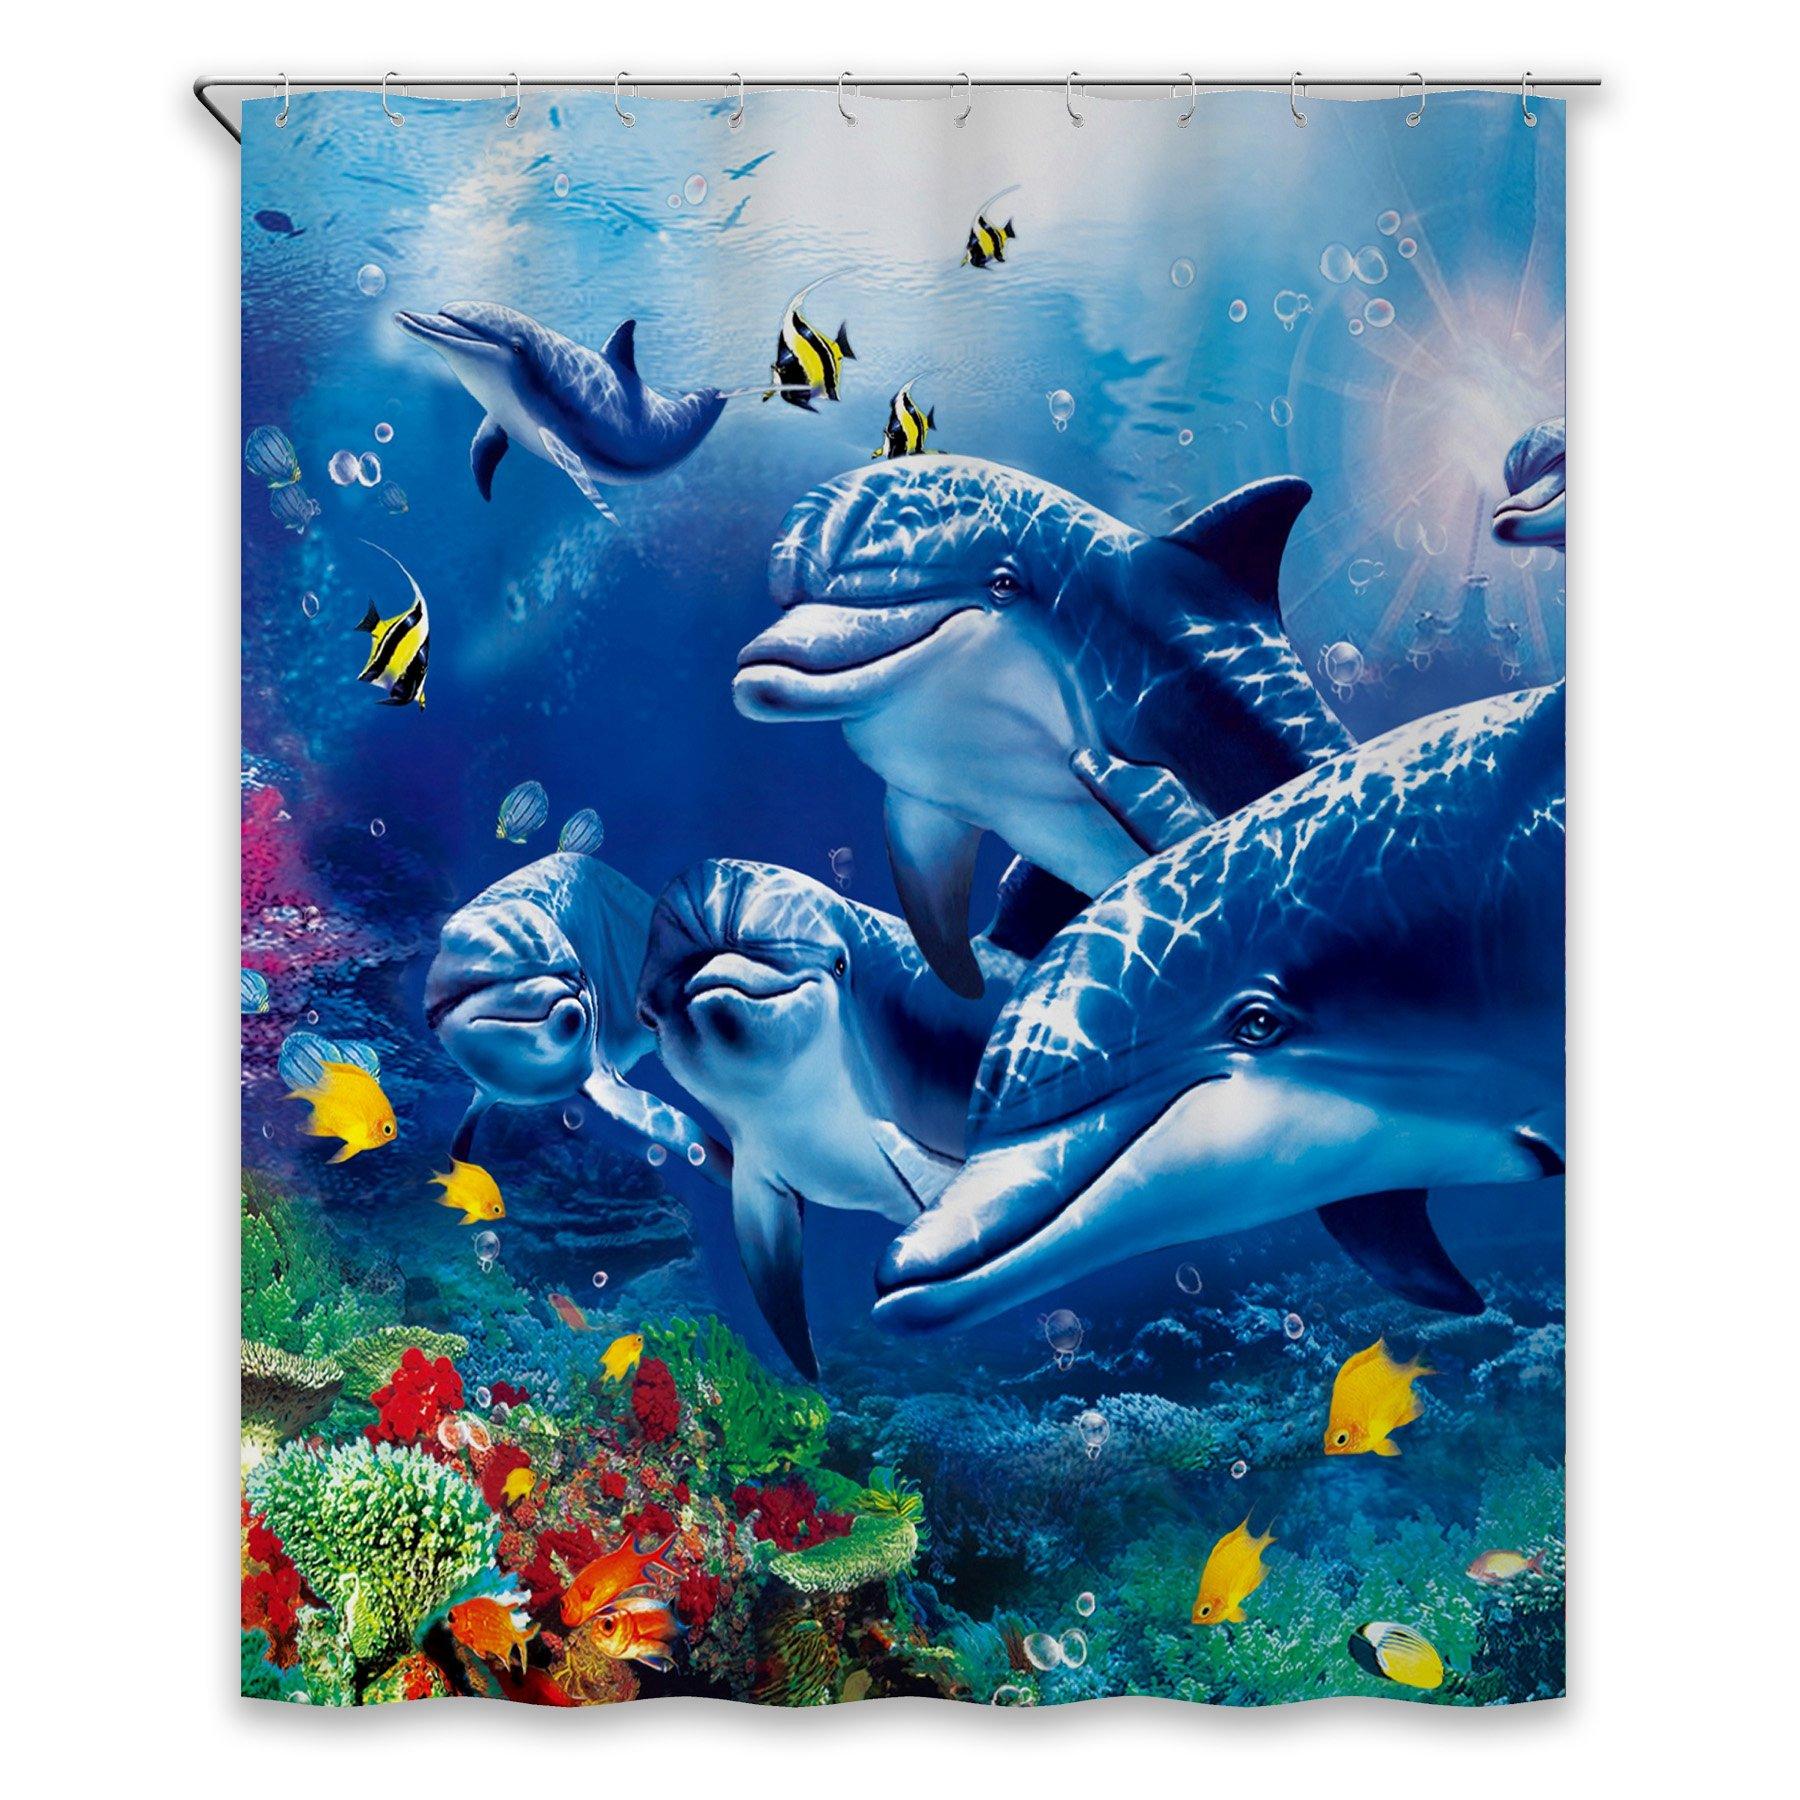 Chunyi Blue Sea World Coral Dolphin Printed Waterproof Shower Curtain Liners 72x72